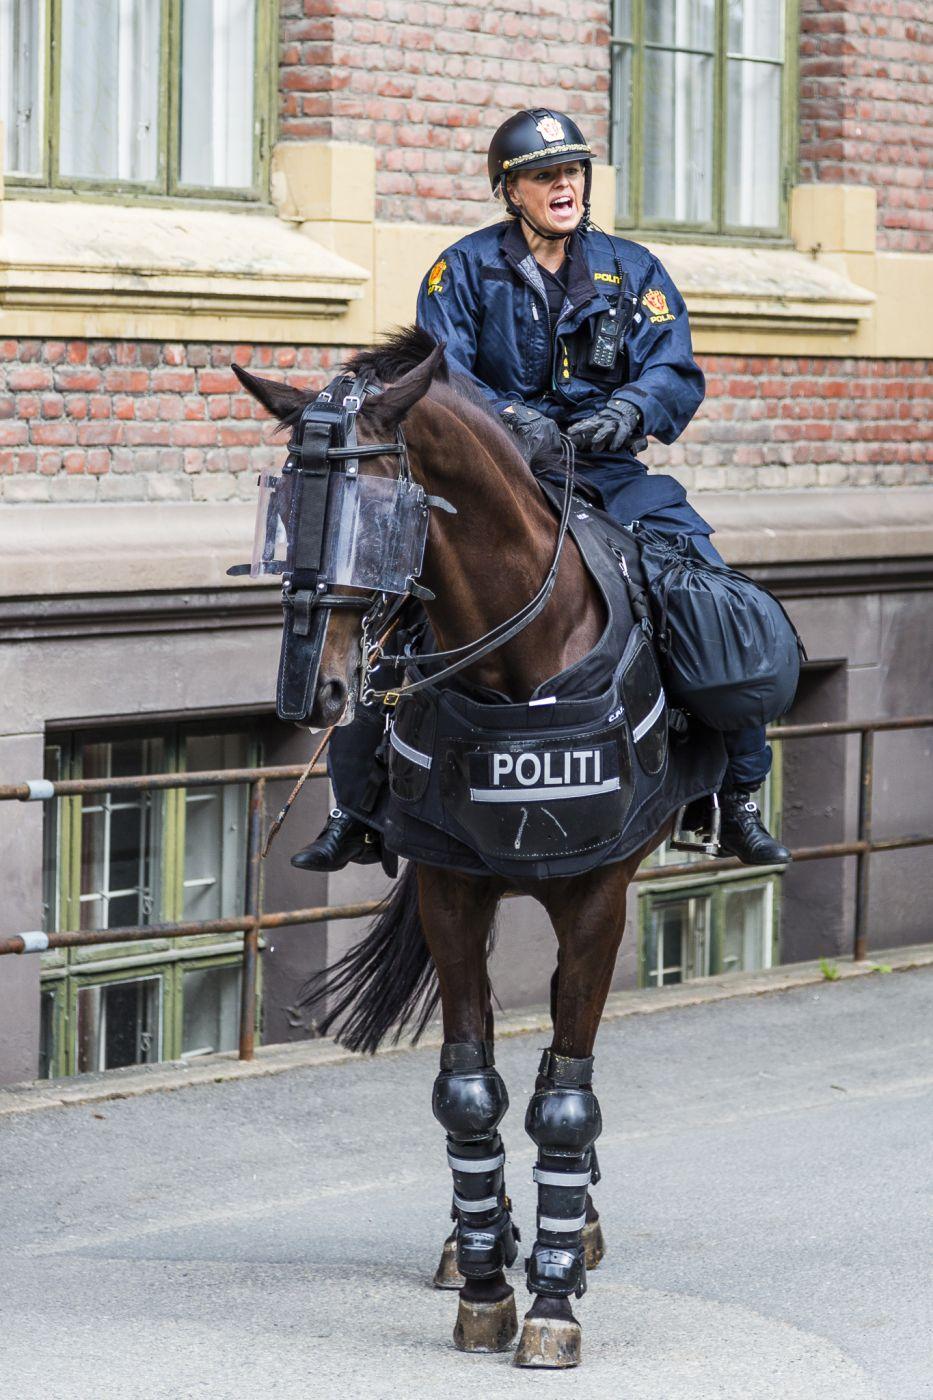 Mounted Police at Akershus Festning, Oslo, Norway